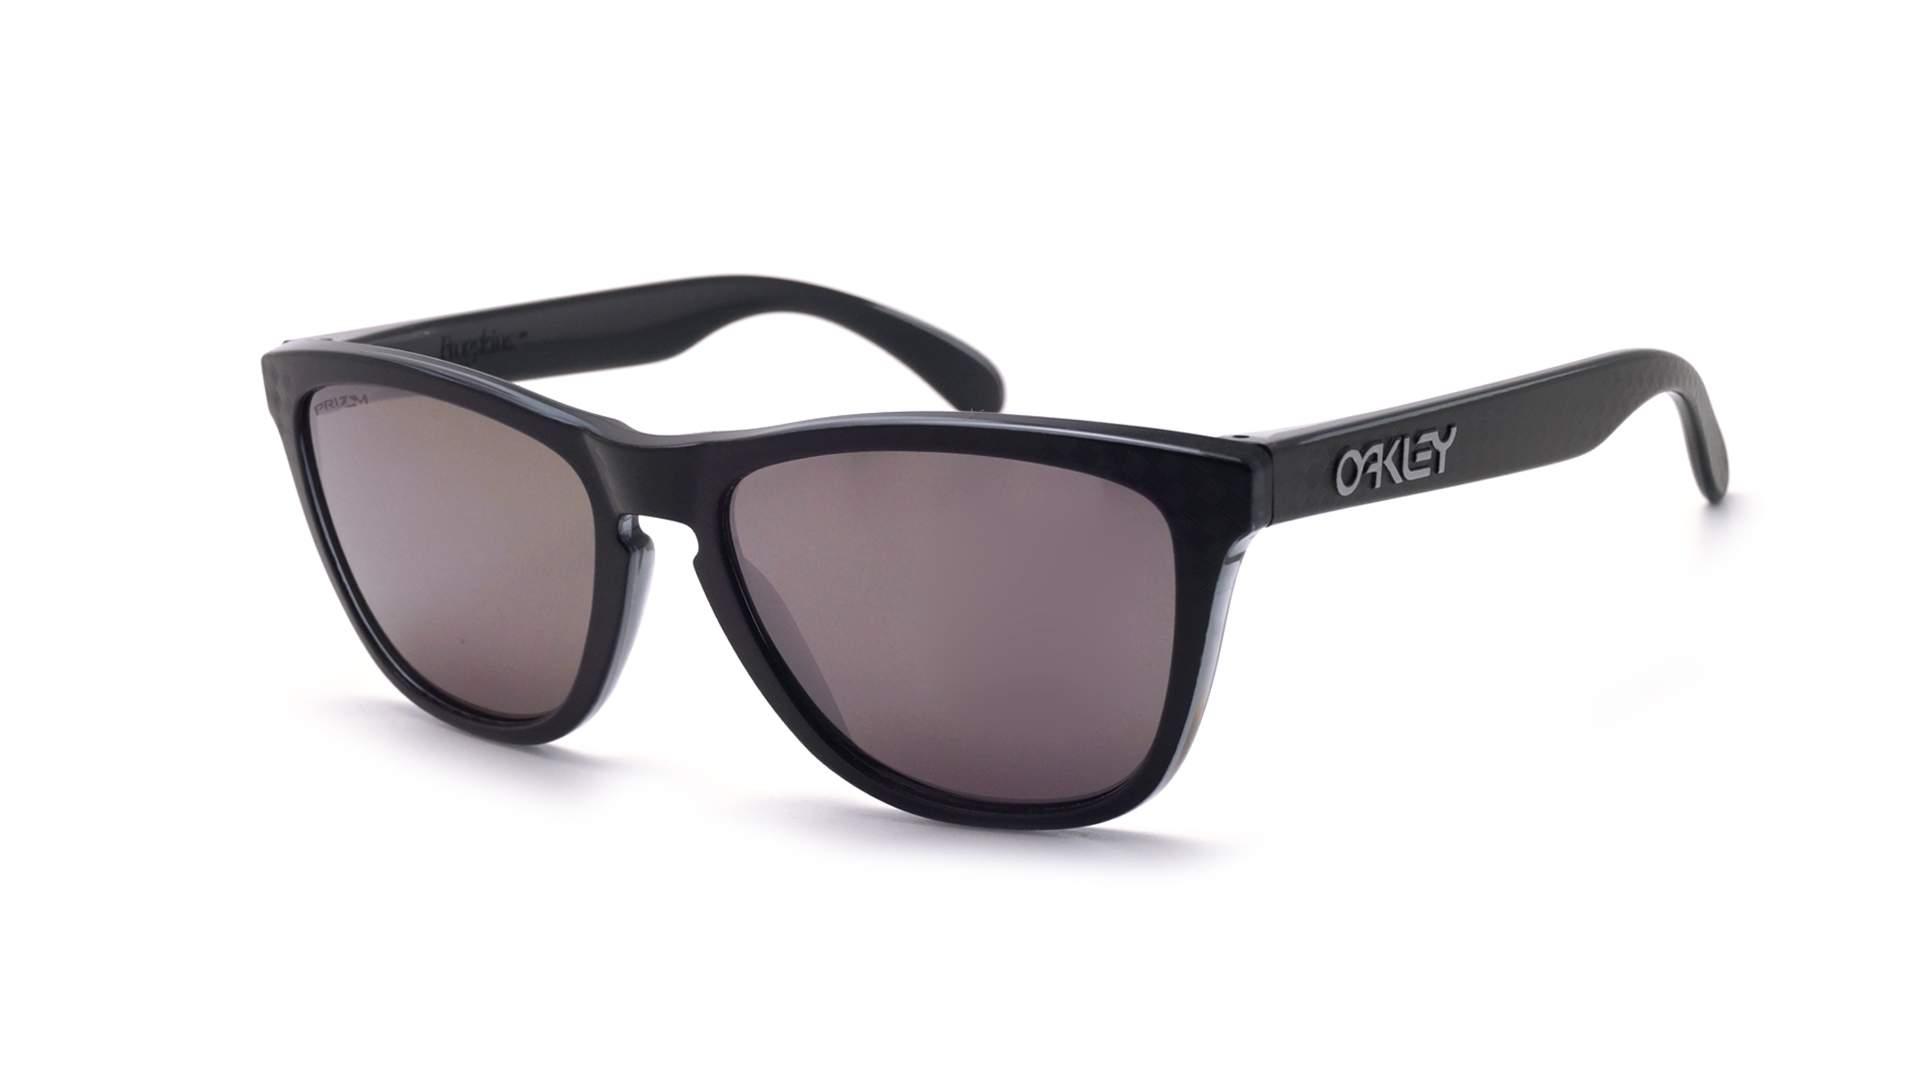 d9273d64c2a ... shop sunglasses oakley frogskins checkbox black matte prizm oo9013 b8  55 17 medium photochromic mirror 34d6d